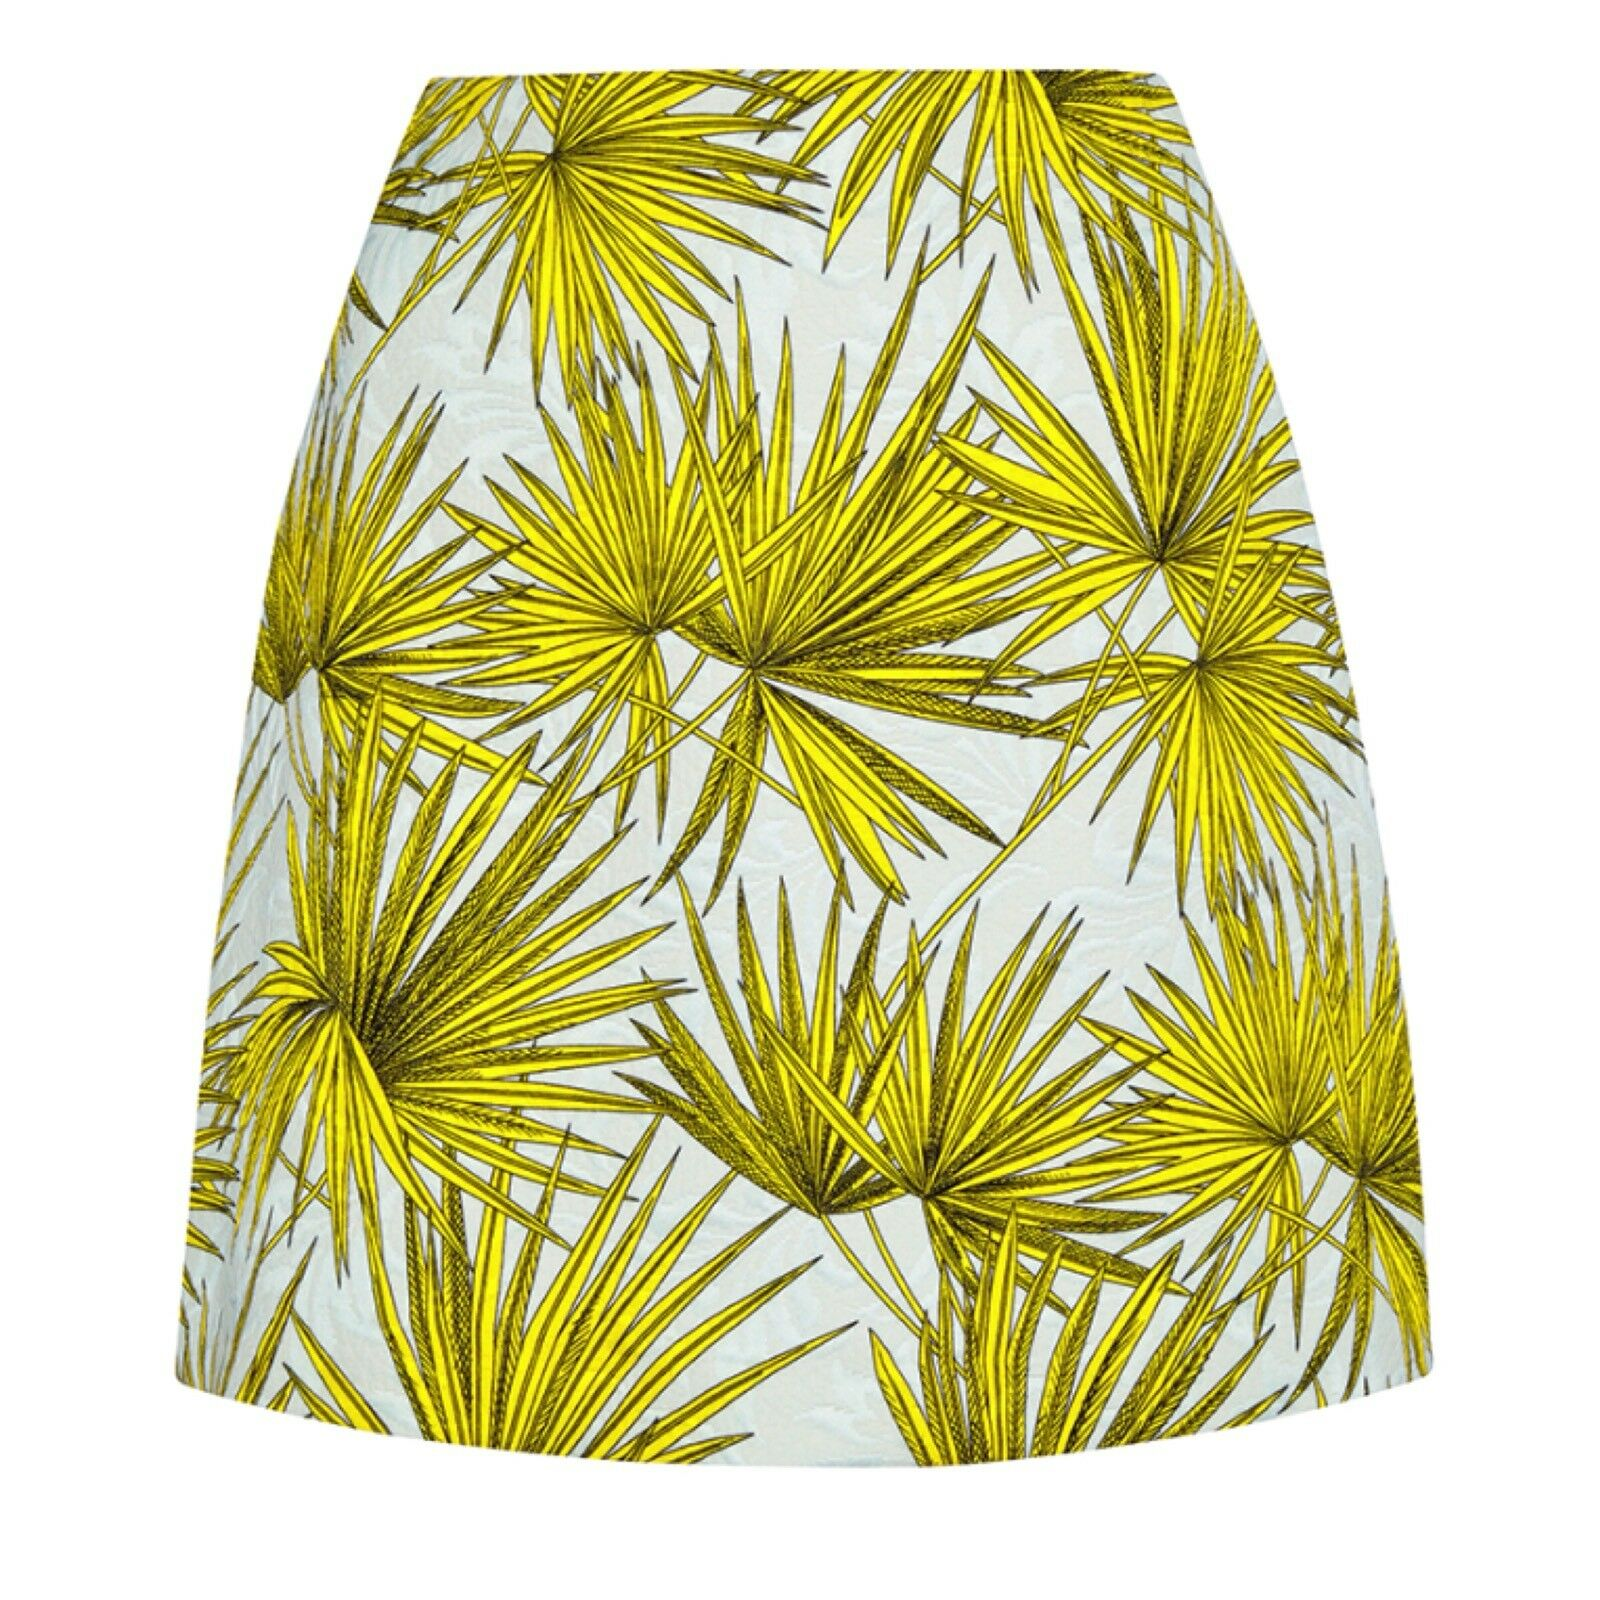 MSGM Frond Palm Print bluee Yellow Mini Skirt Size 42 US 6